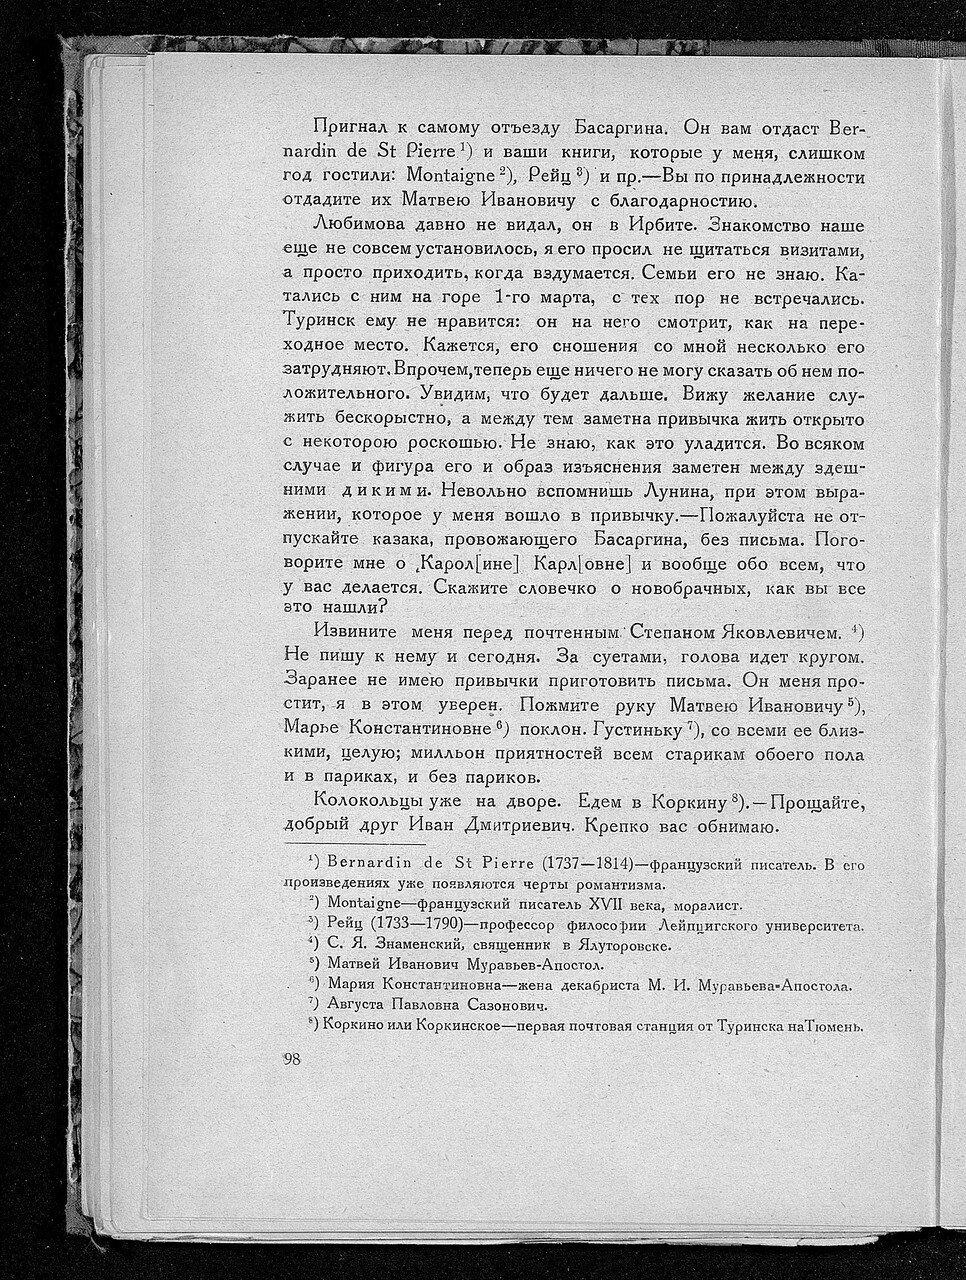 https://img-fotki.yandex.ru/get/876984/199368979.a1/0_21435d_24073df9_XXXL.jpg